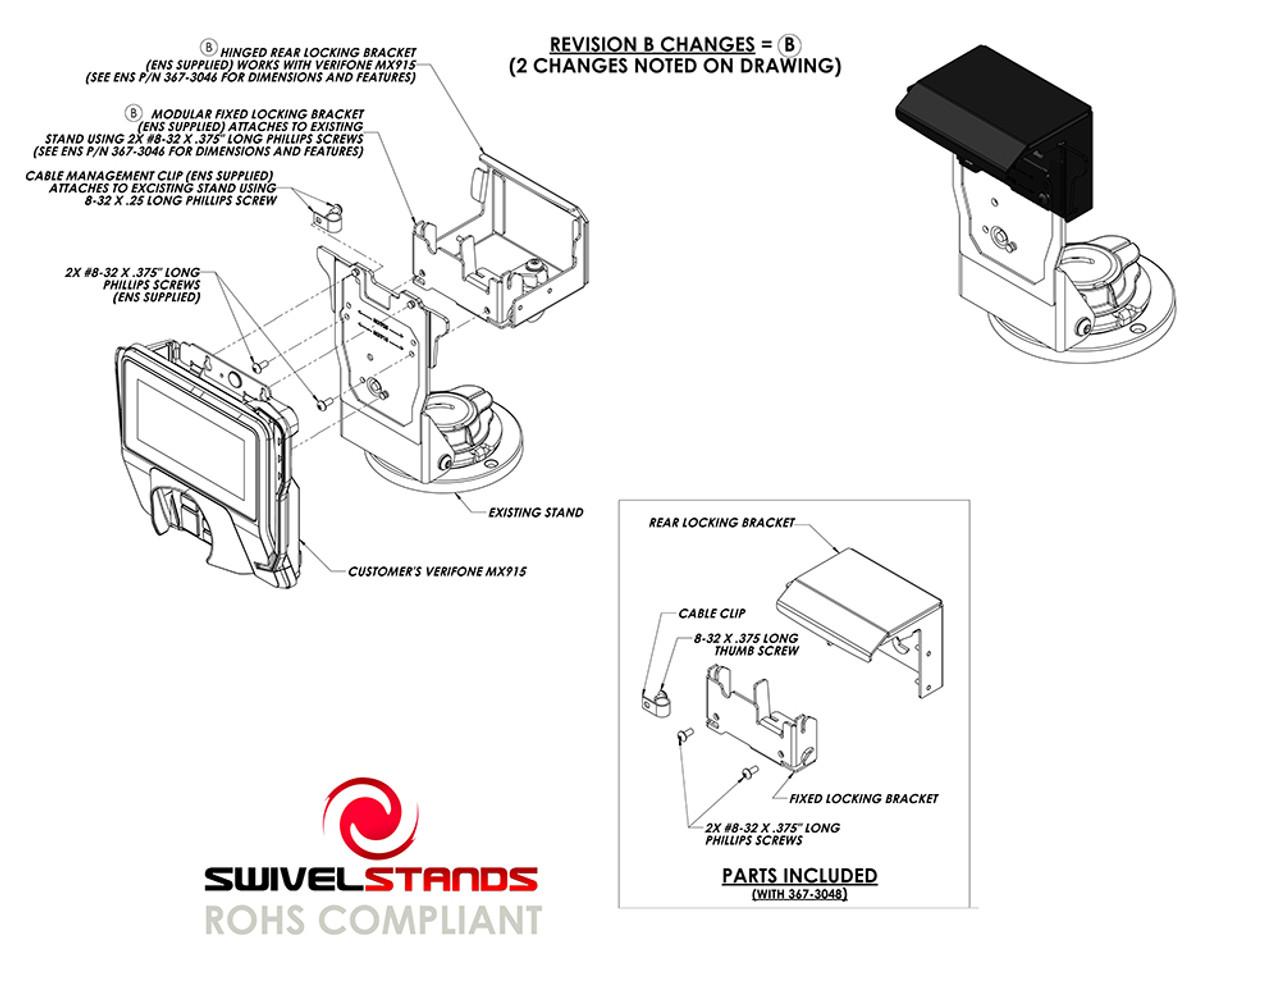 Verifone MX915 Rear Locking Add On Bracket by Swivel Stands